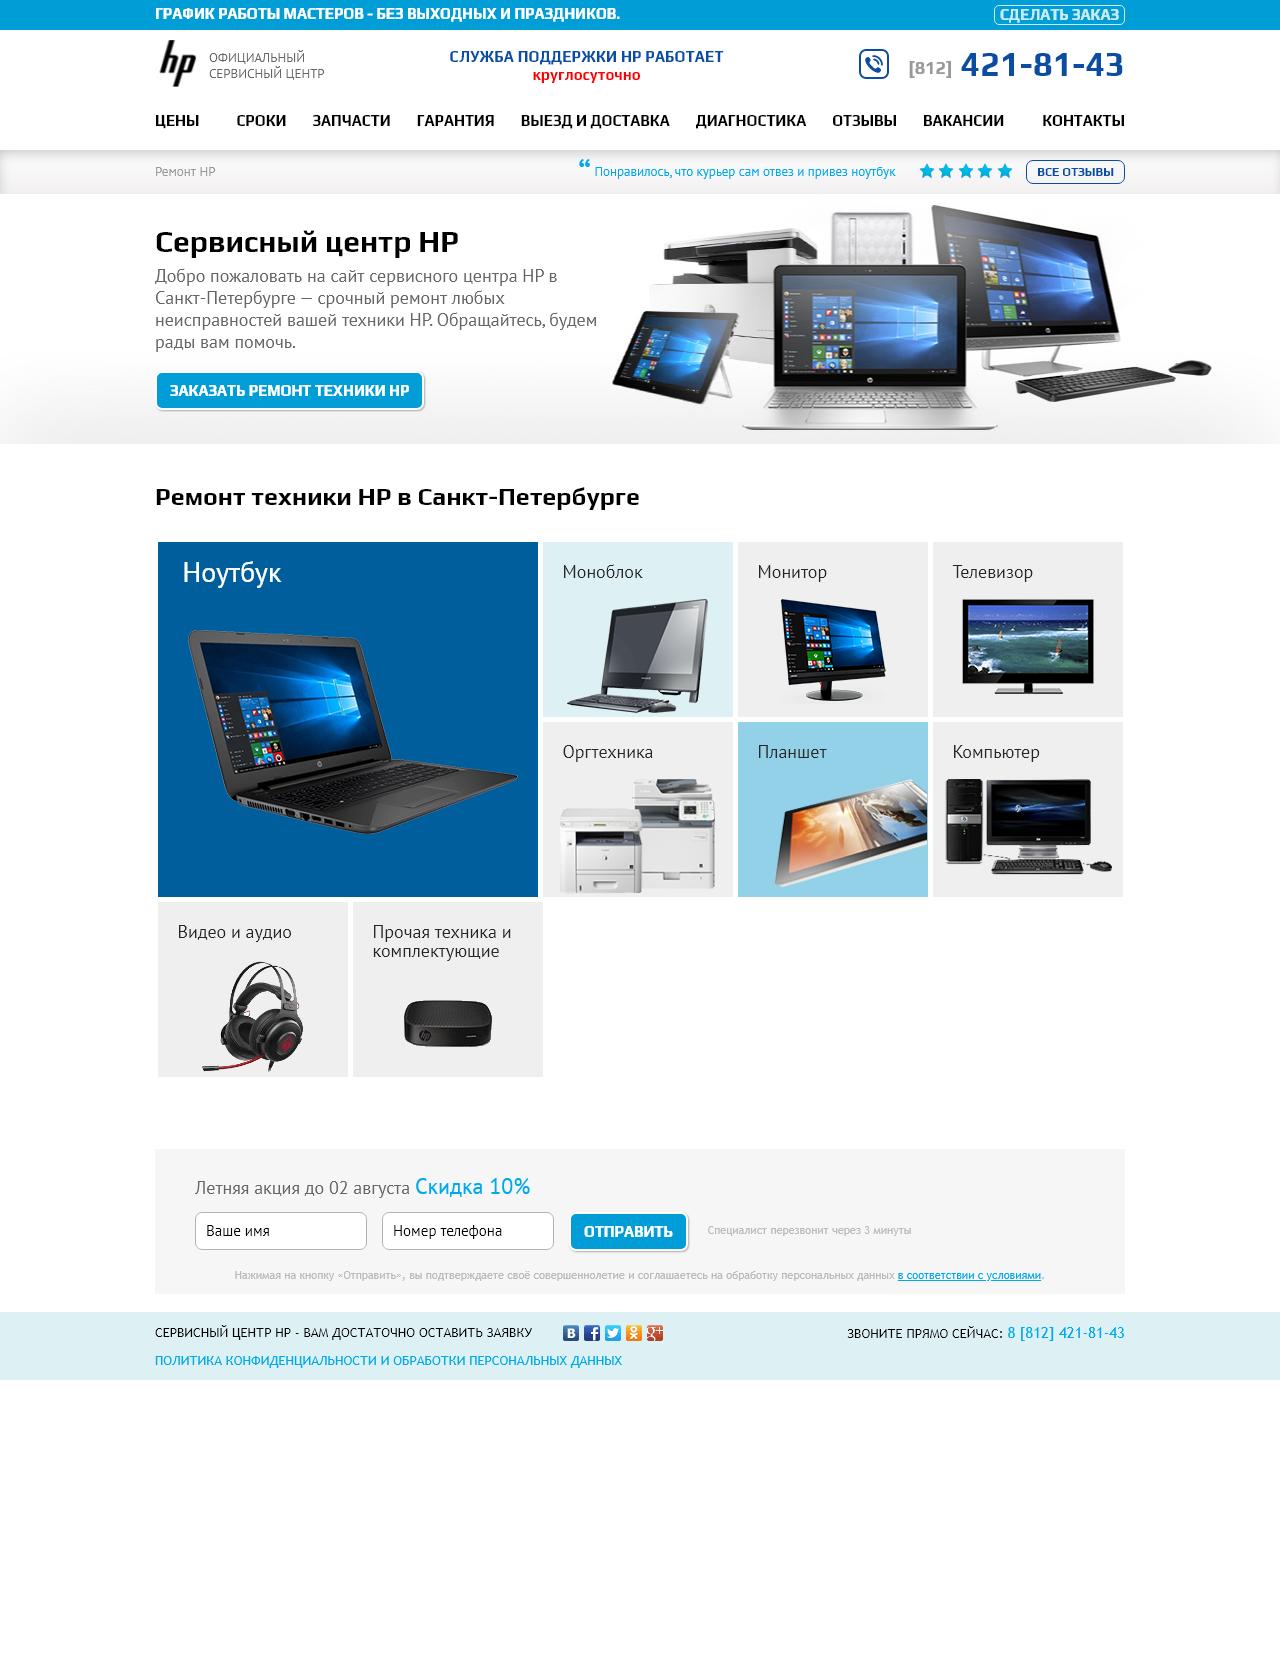 Screenshot Desktop - https://spb.remxp.com/